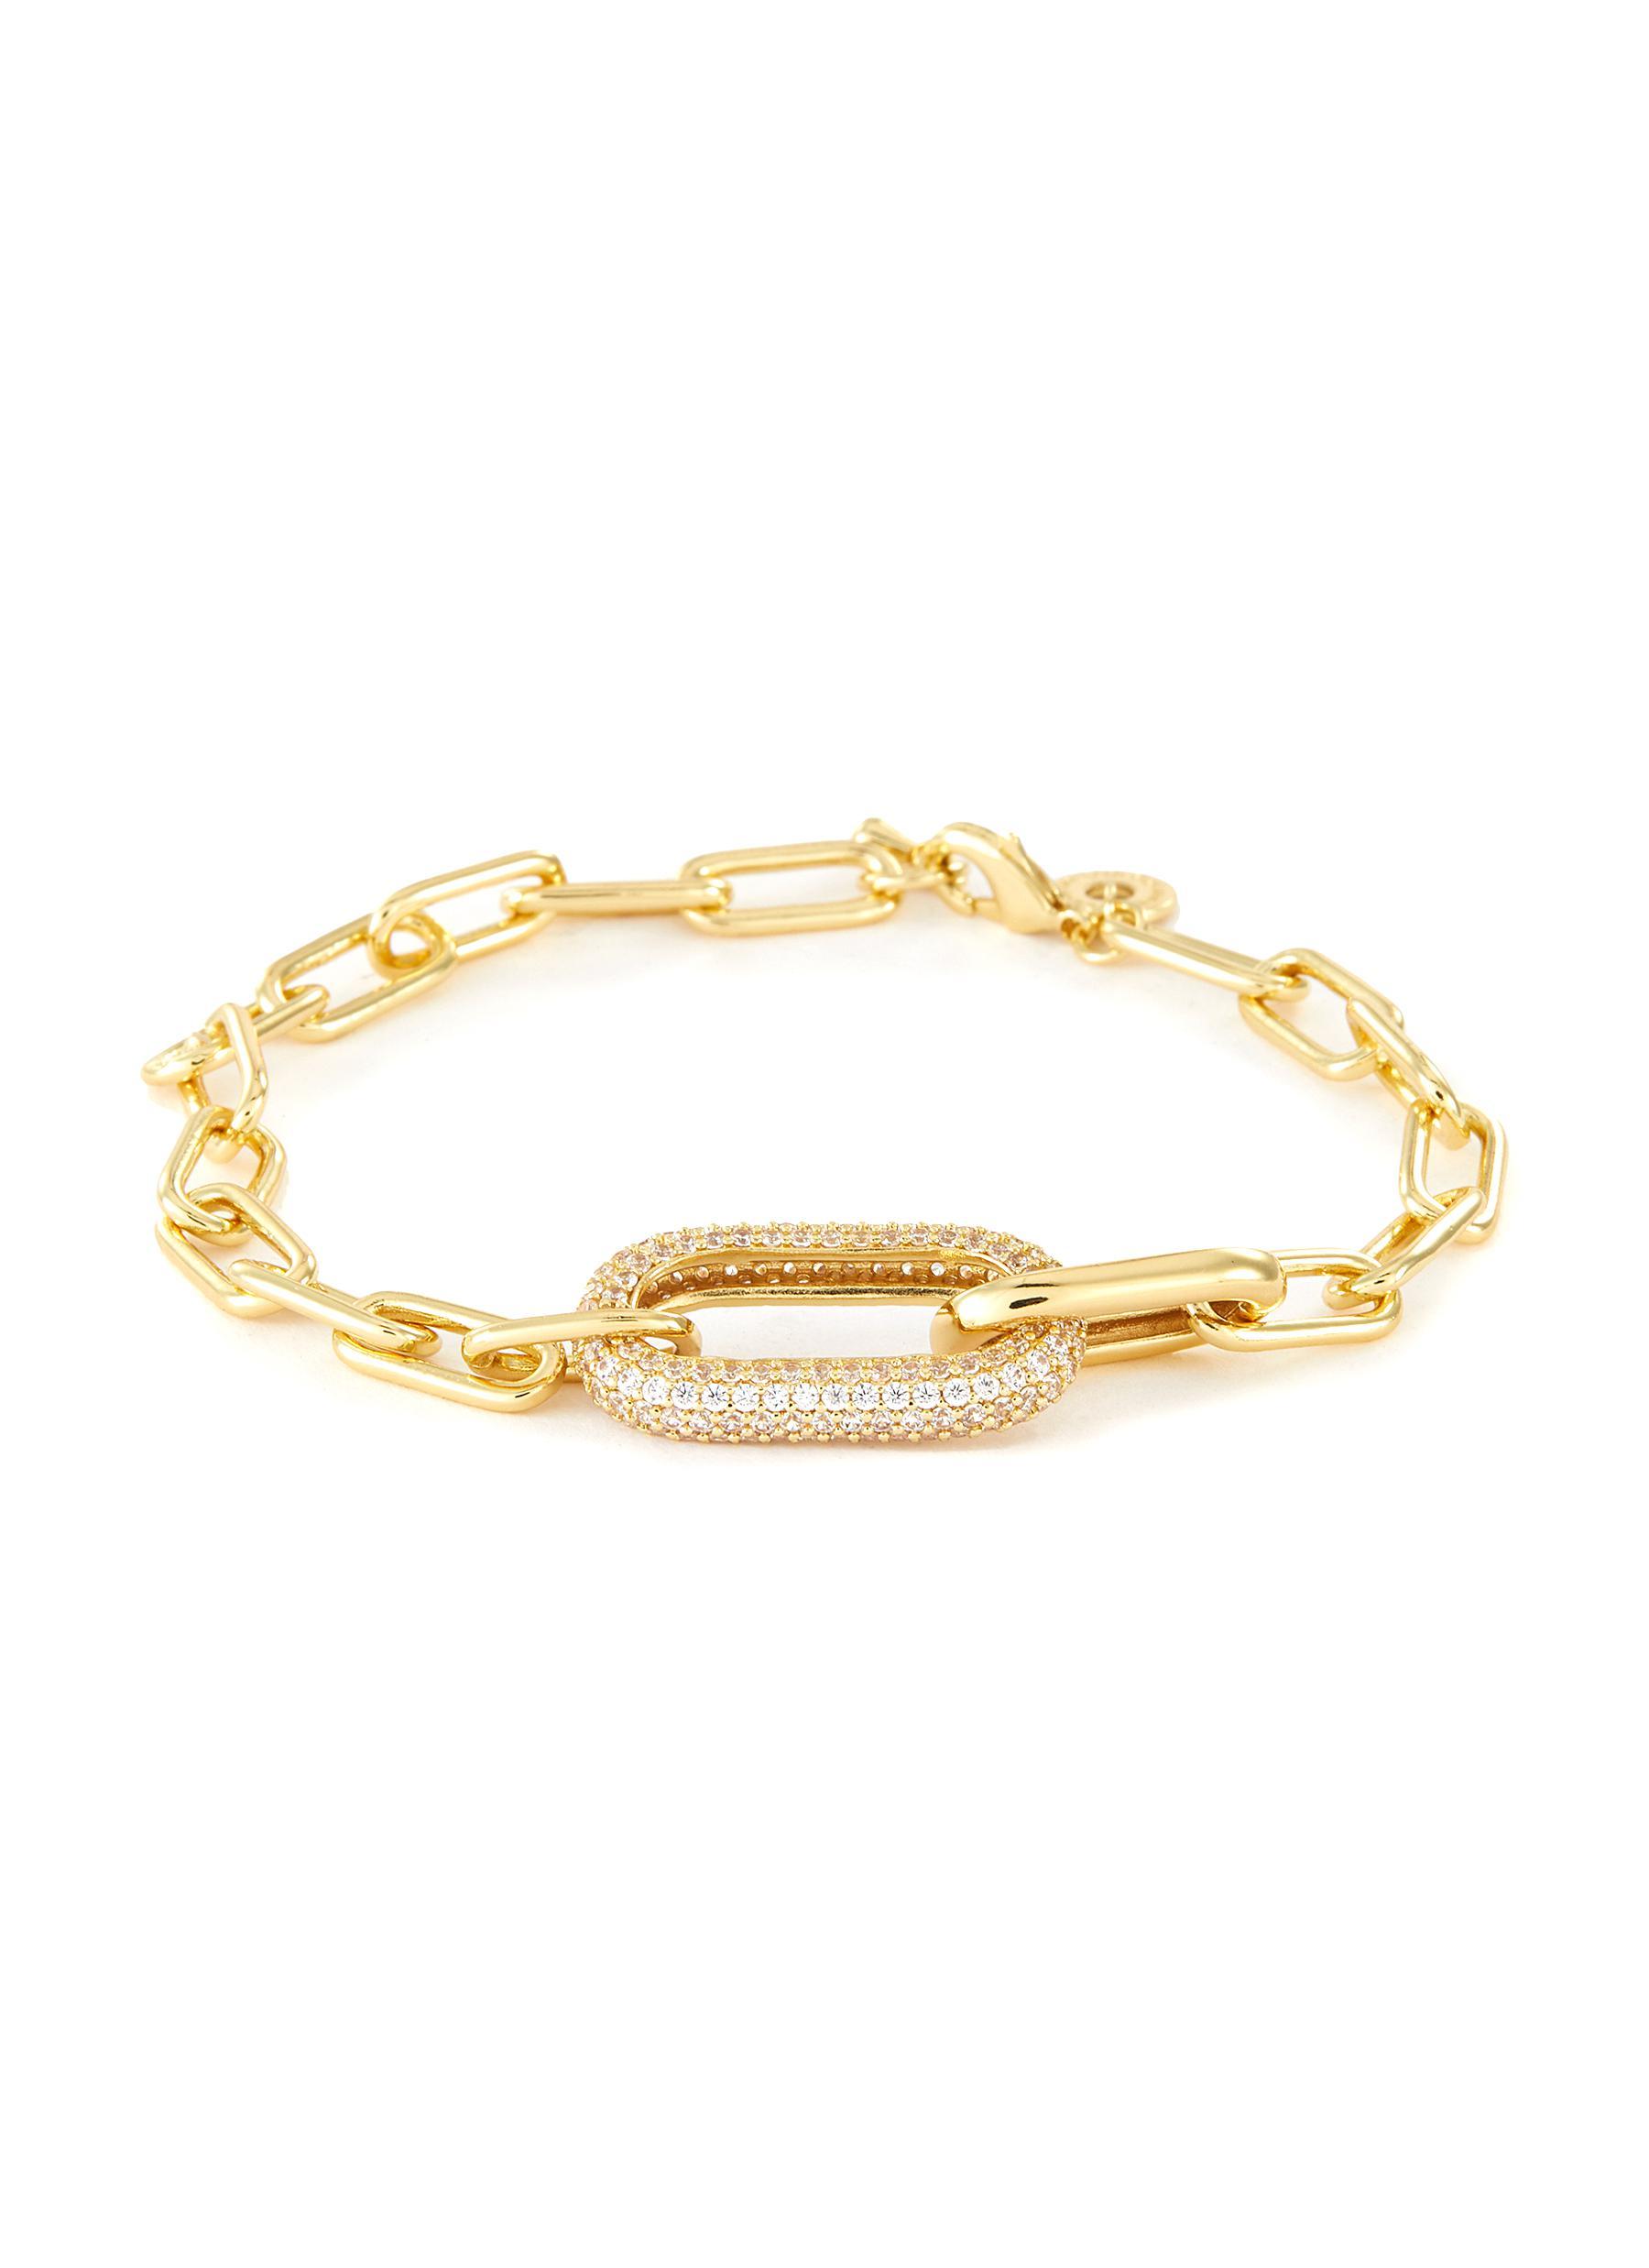 Cubic Zirconia Oval Link Chain Bracelet